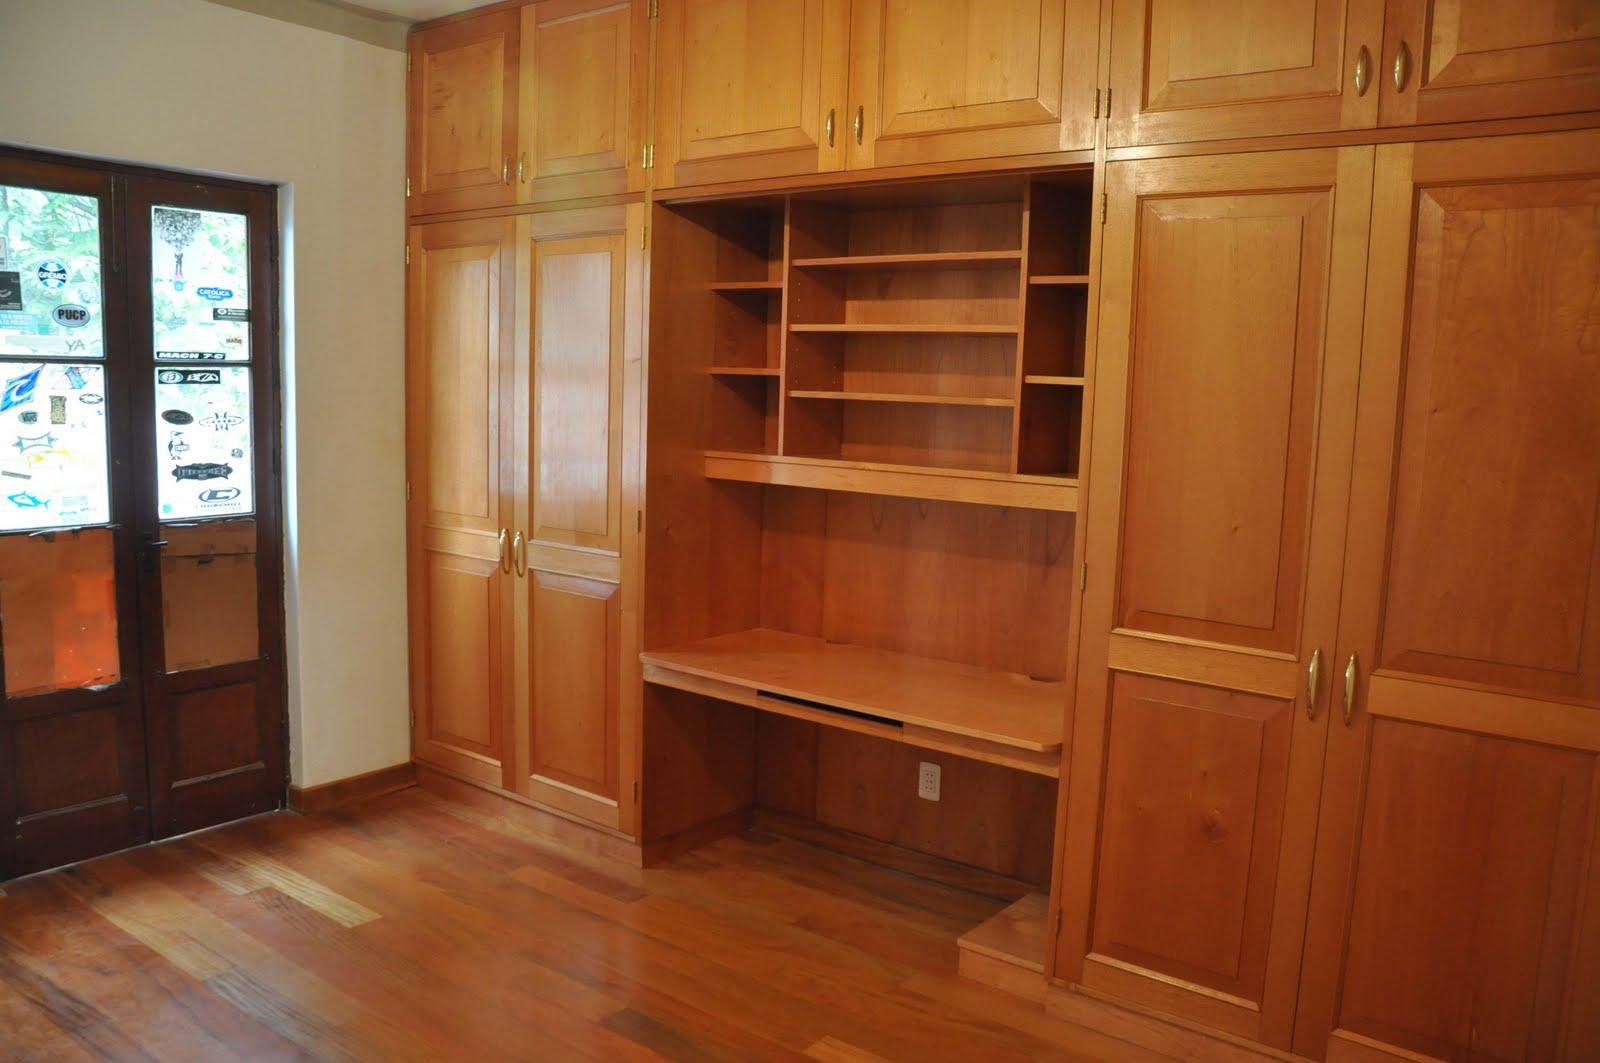 Fidel fern ndez e hijos muebles finos de madera una for Closets finos madera